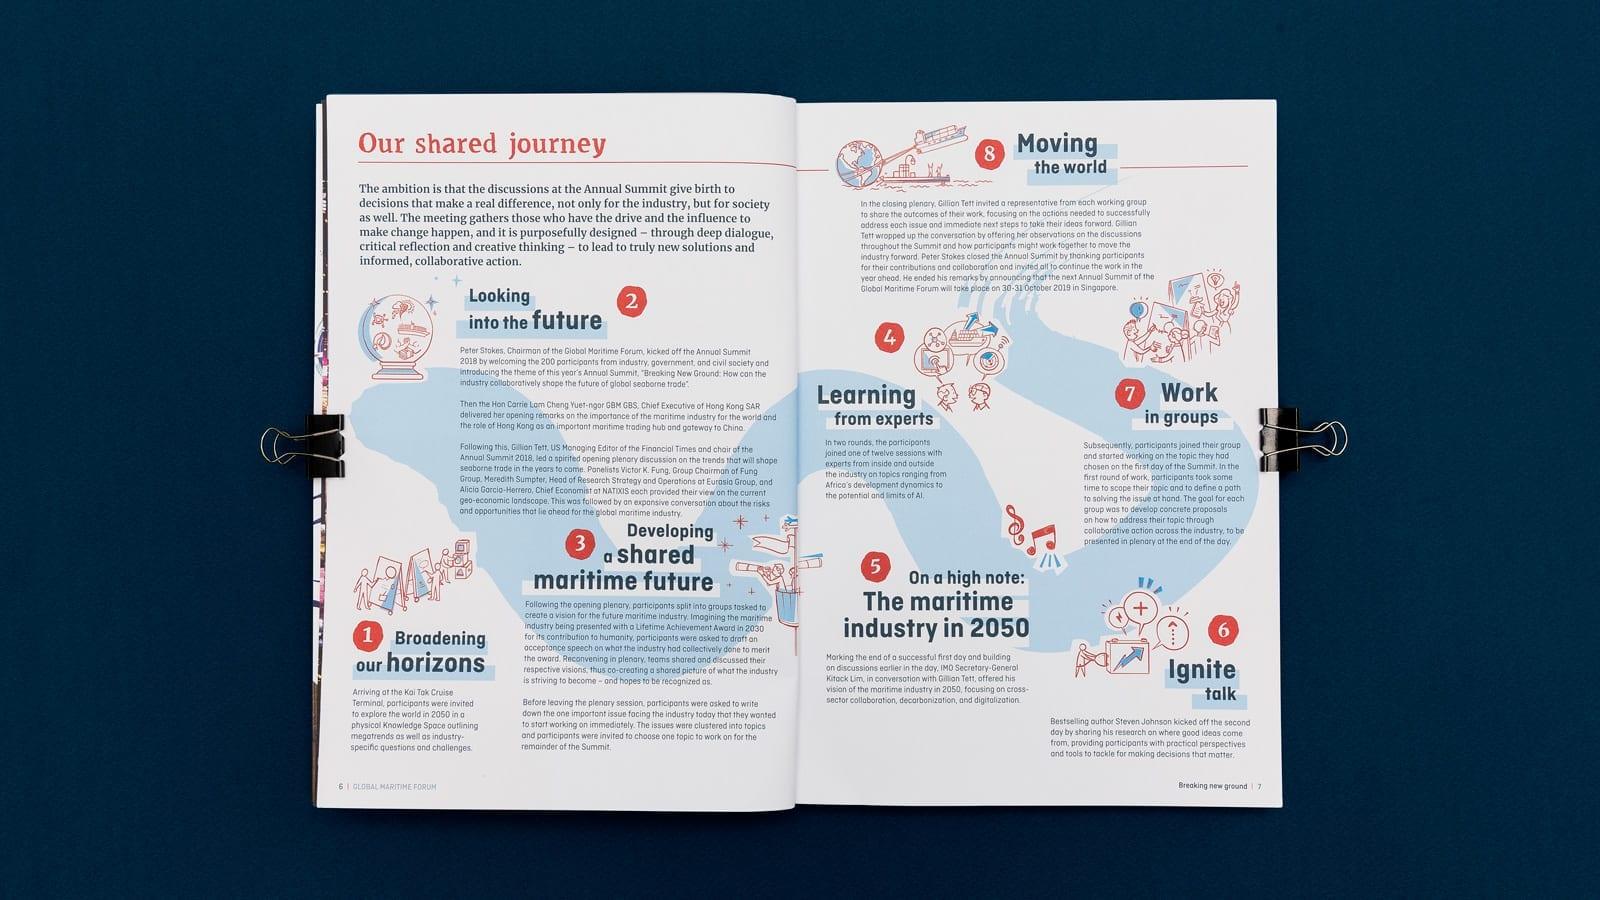 A necessary path | Housatonic